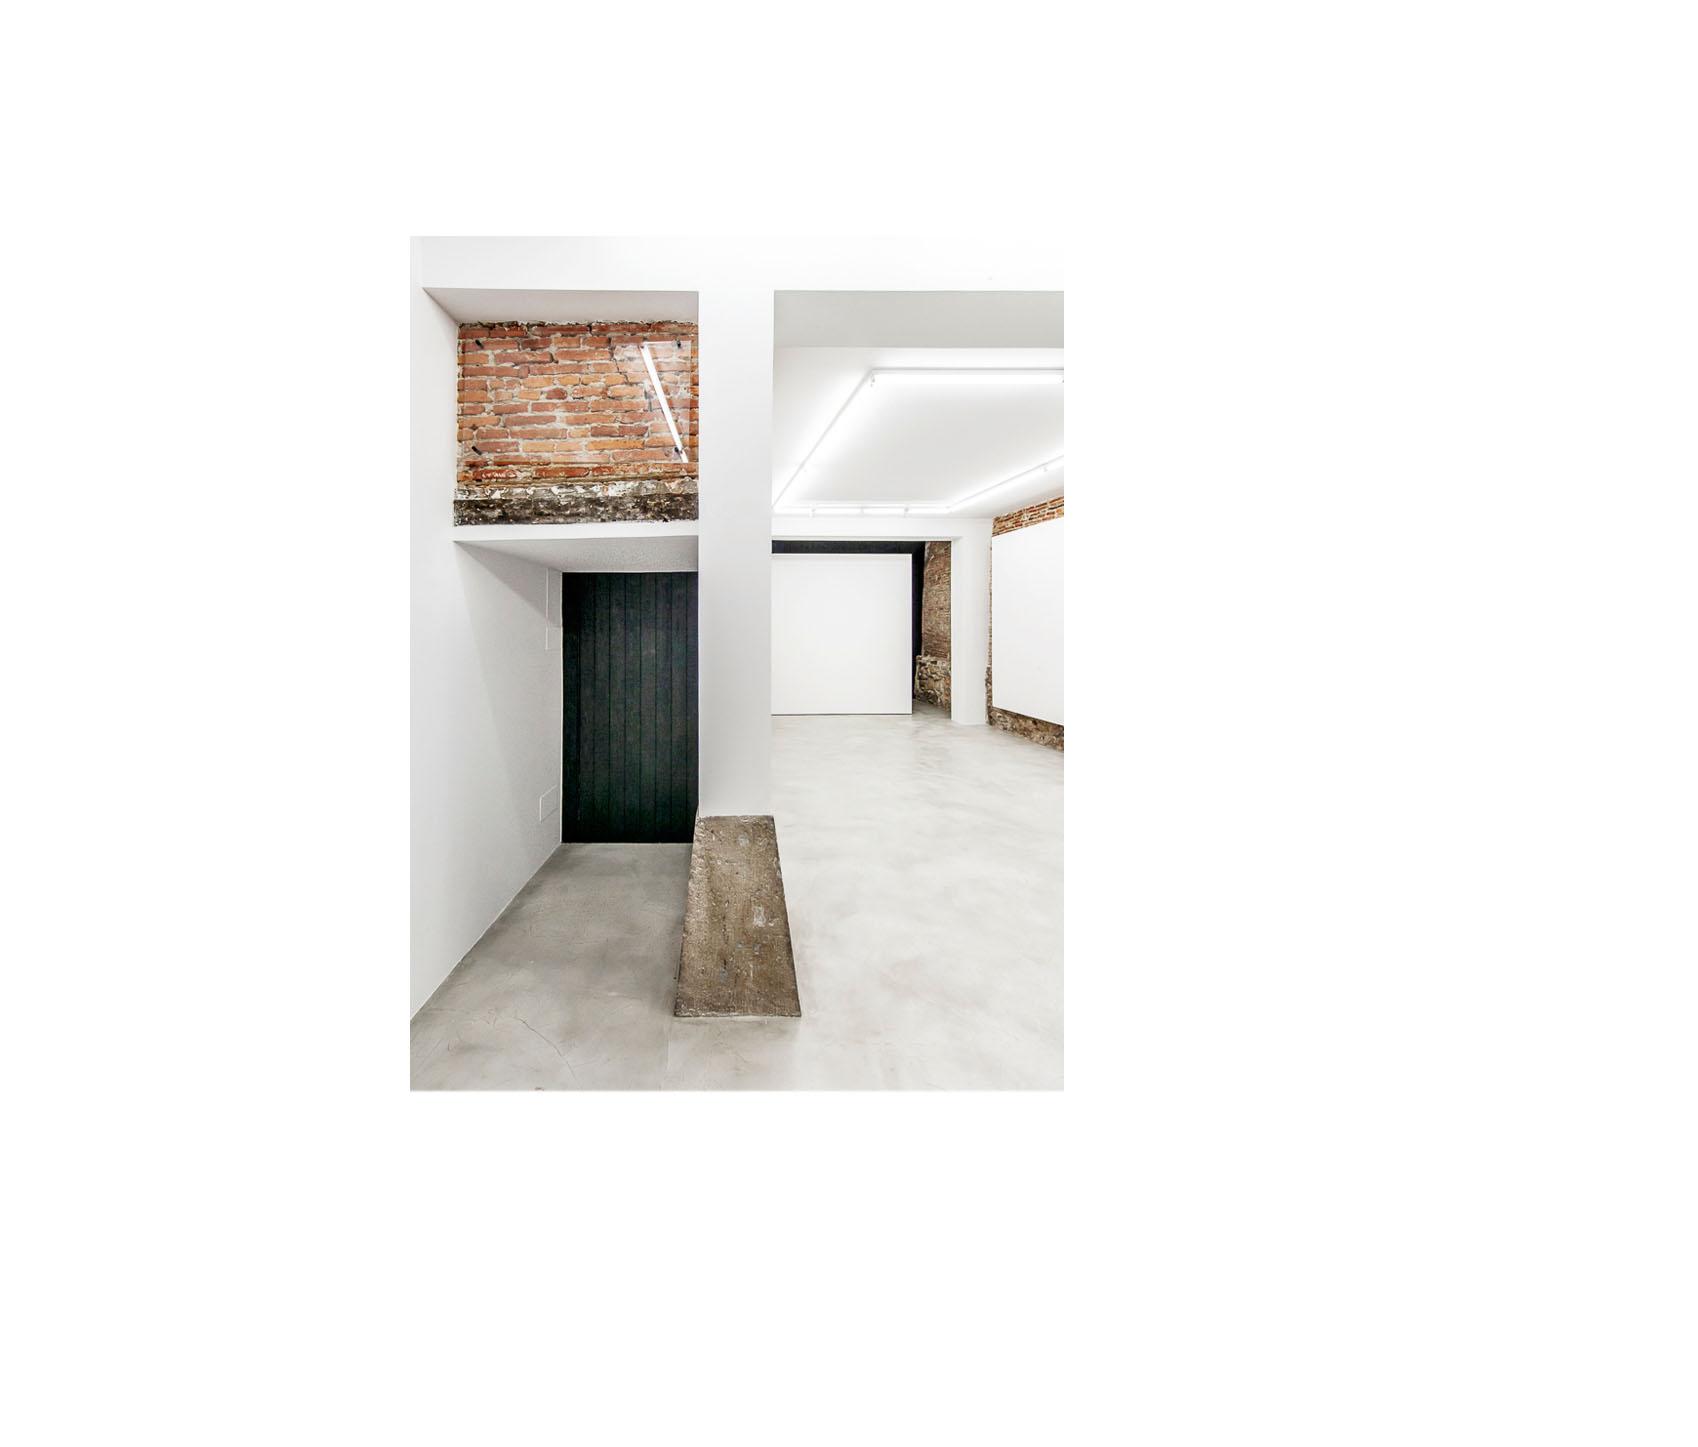 Art Gallery Aldama-Fabré-Bilbao-Image 09.jpg